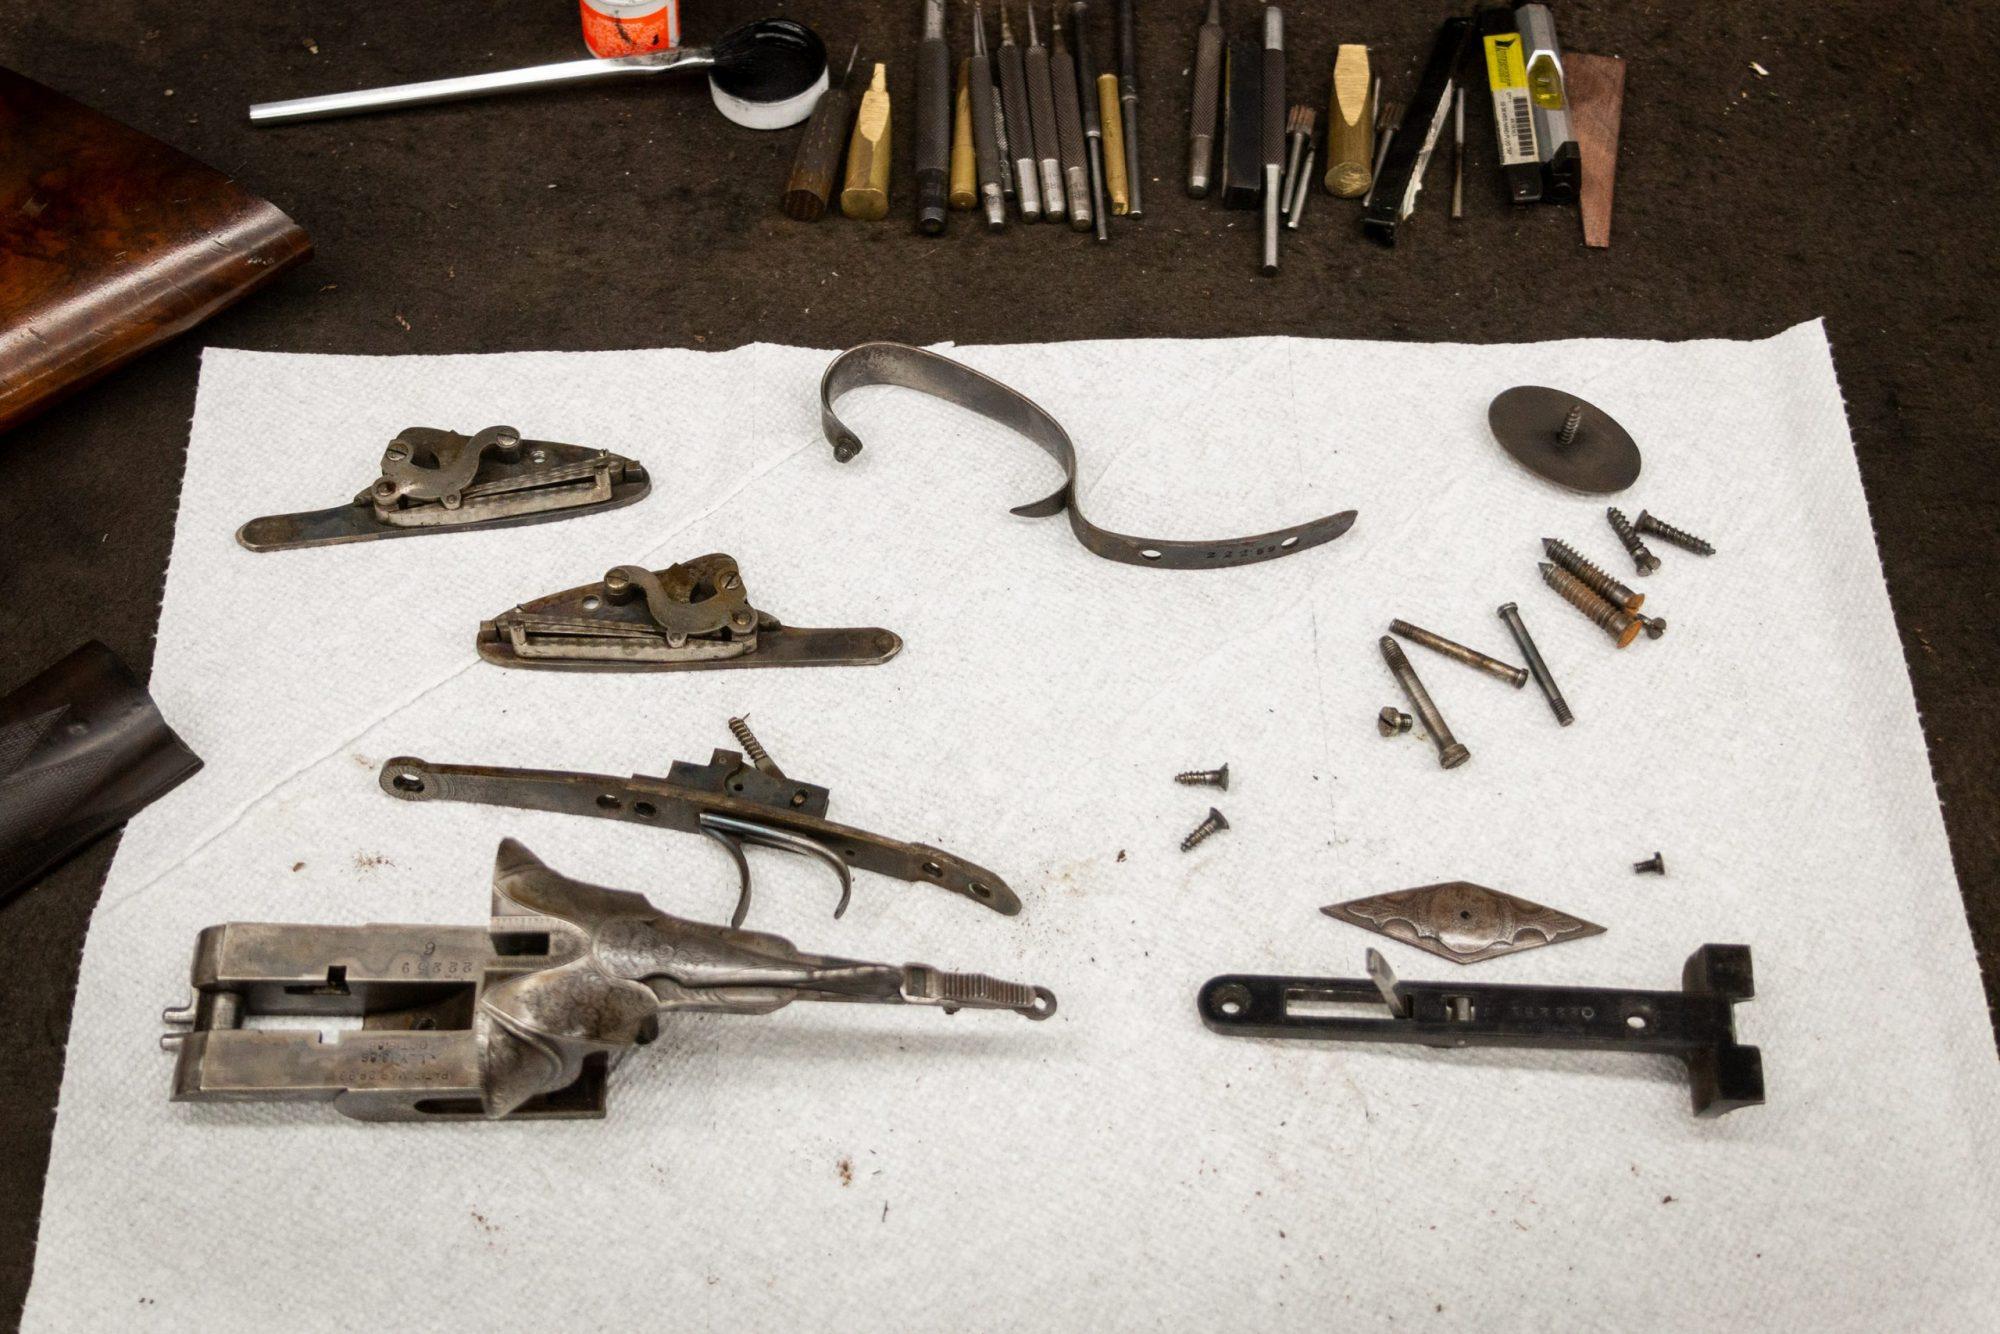 Photo of an L.C. Smith 10 gauge shotgun undergoing restoration, by Turnbull Restoration of Bloomfield, NY